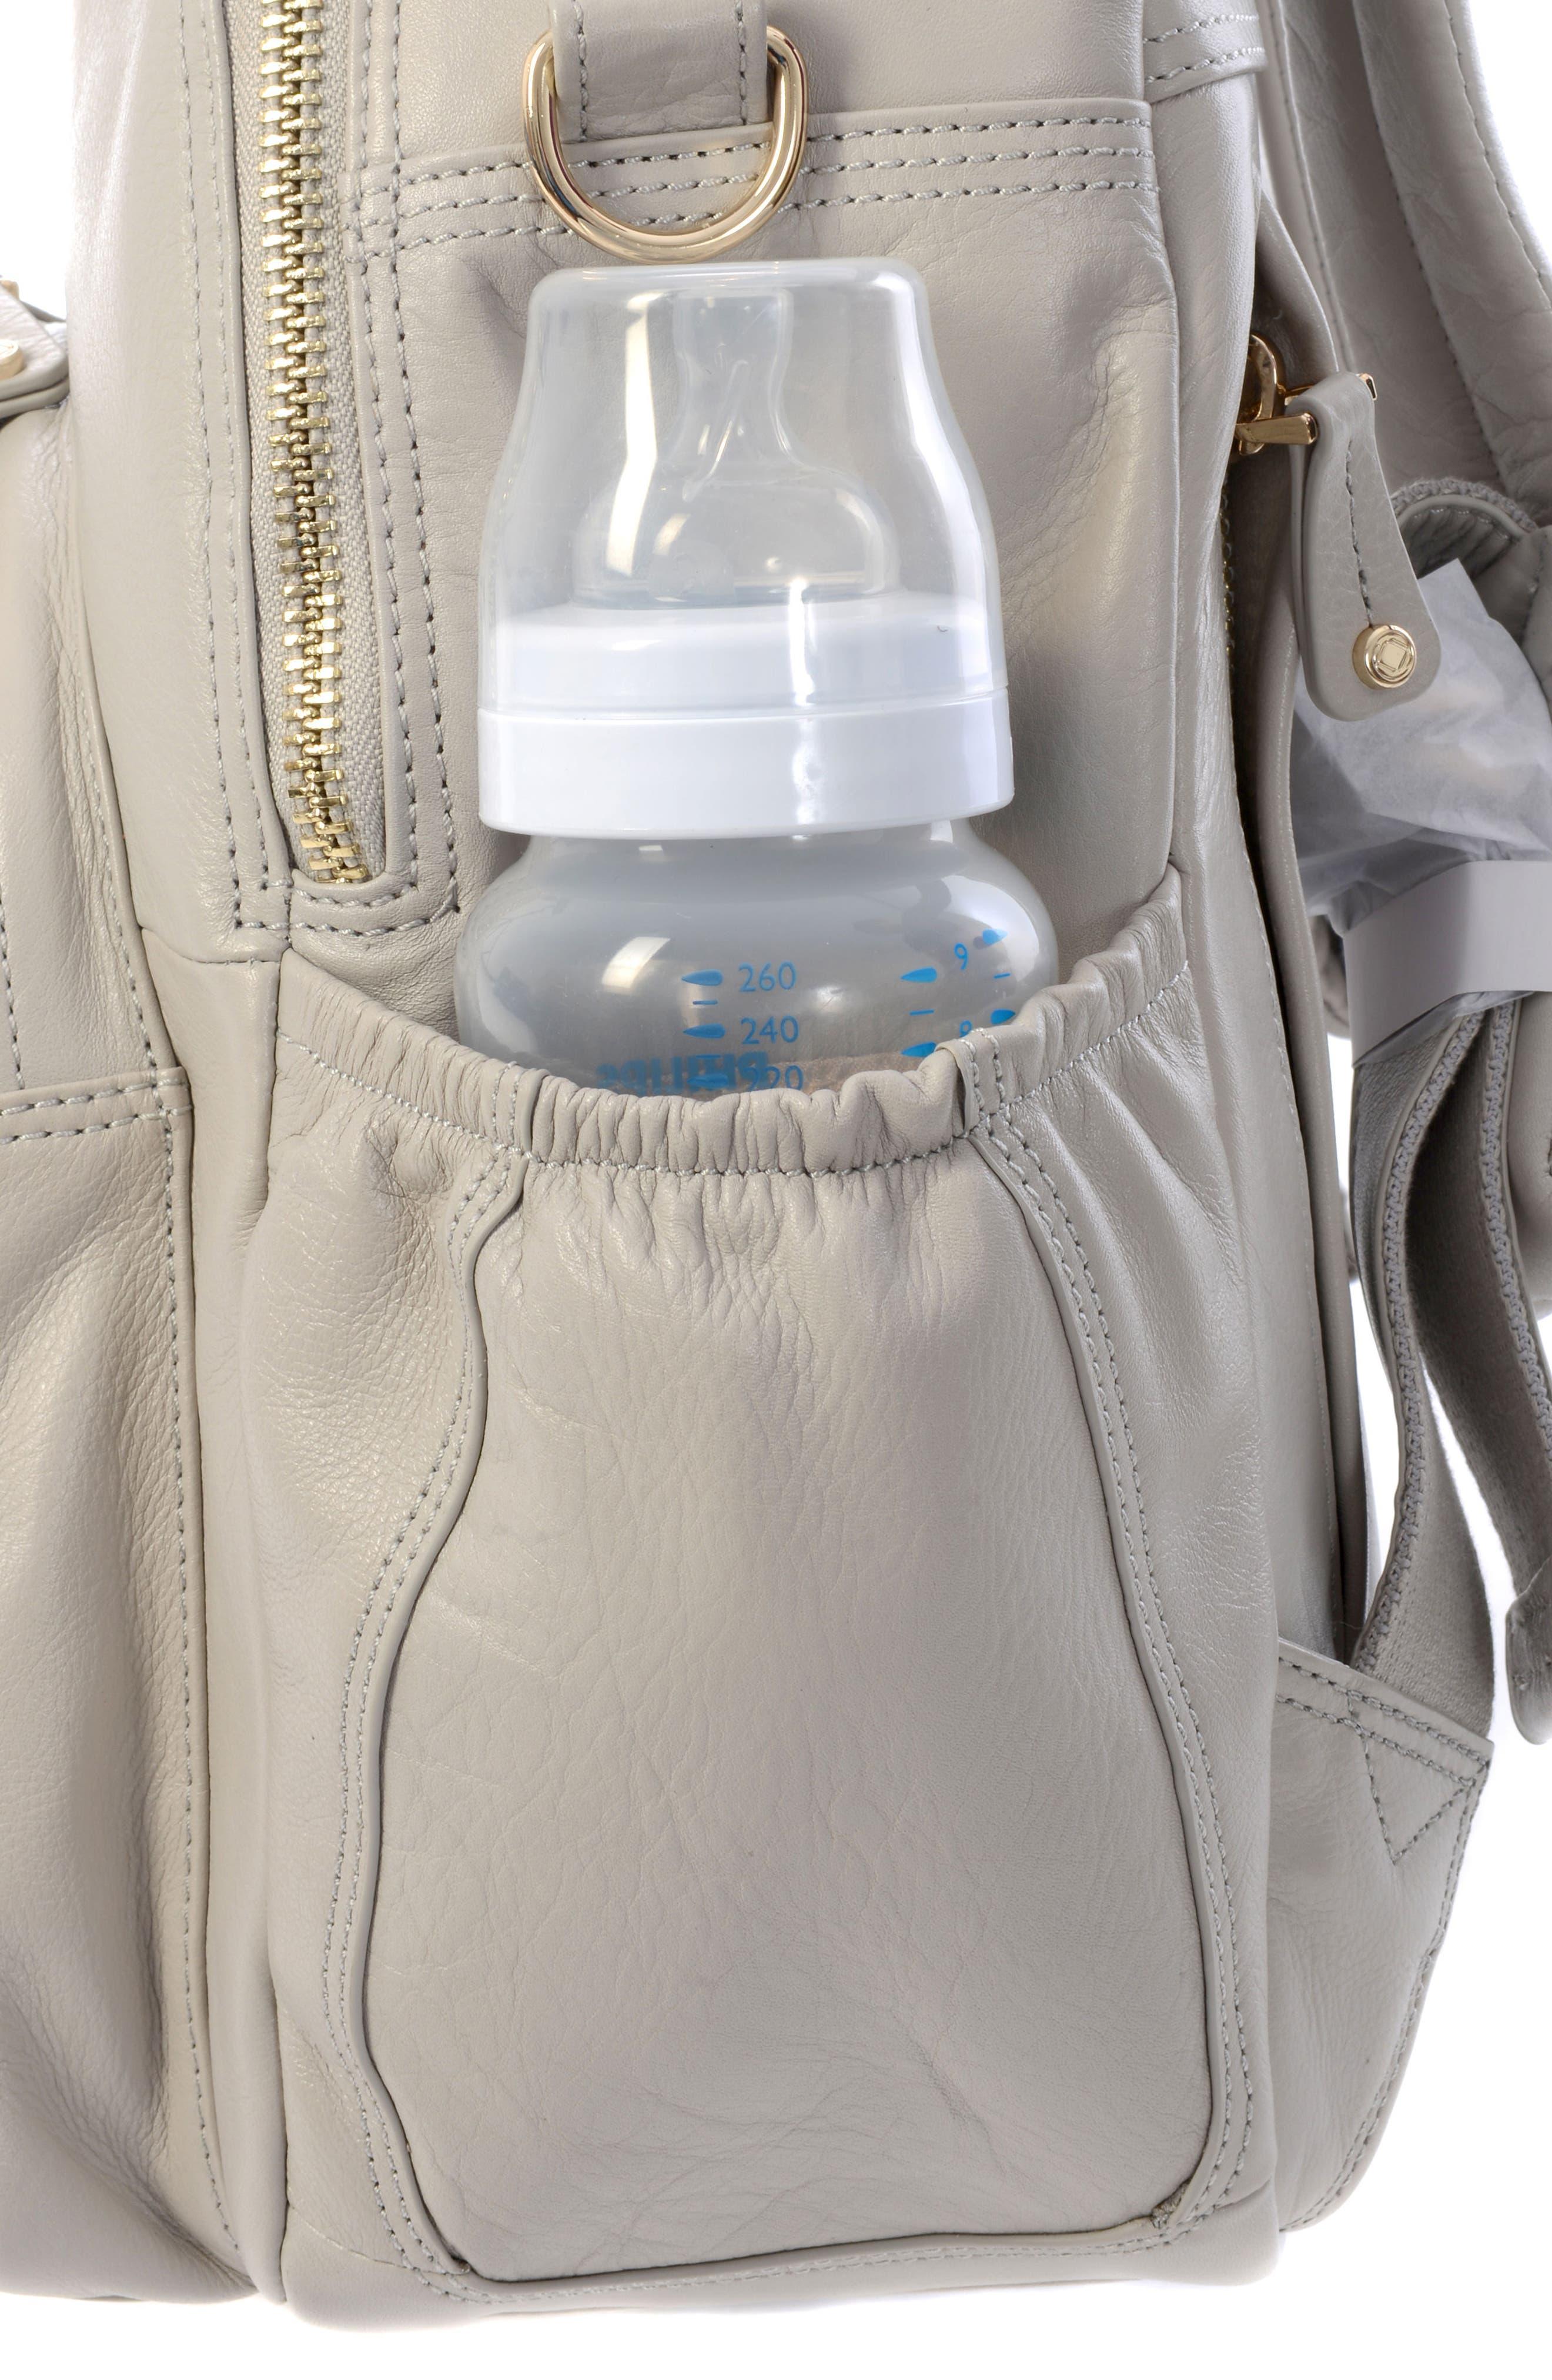 Joy XL Leather Backpack,                             Alternate thumbnail 16, color,                             Ice Grey